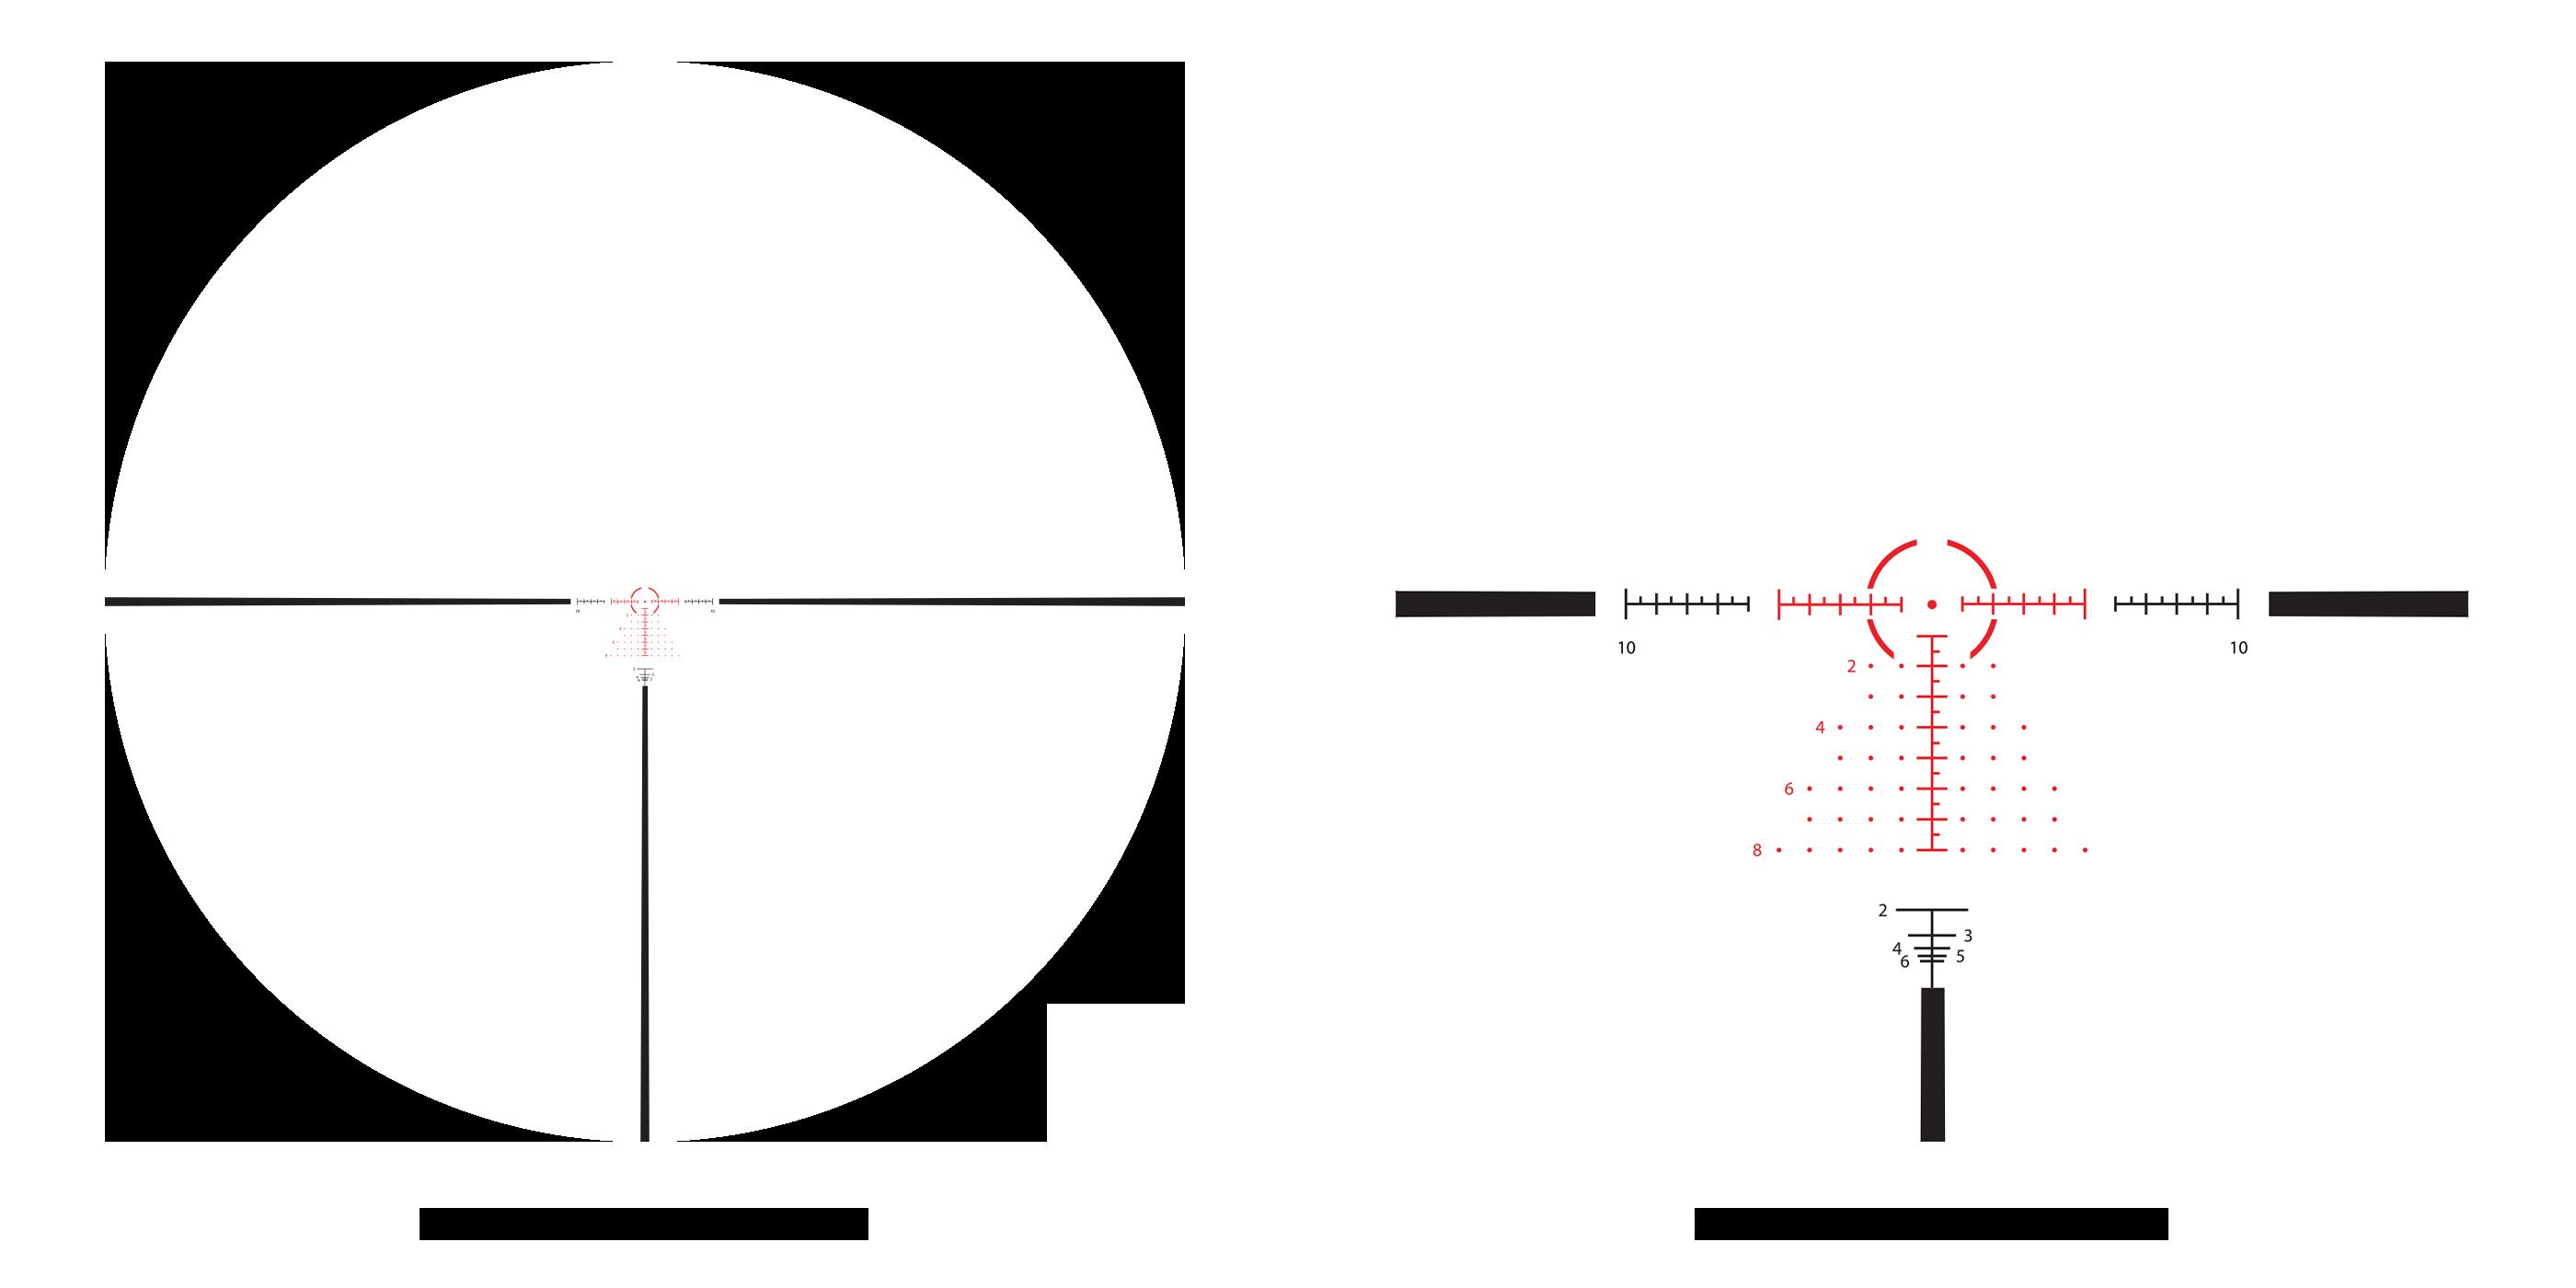 DMR scope with AHMR2 MIL 2x-12x reticle